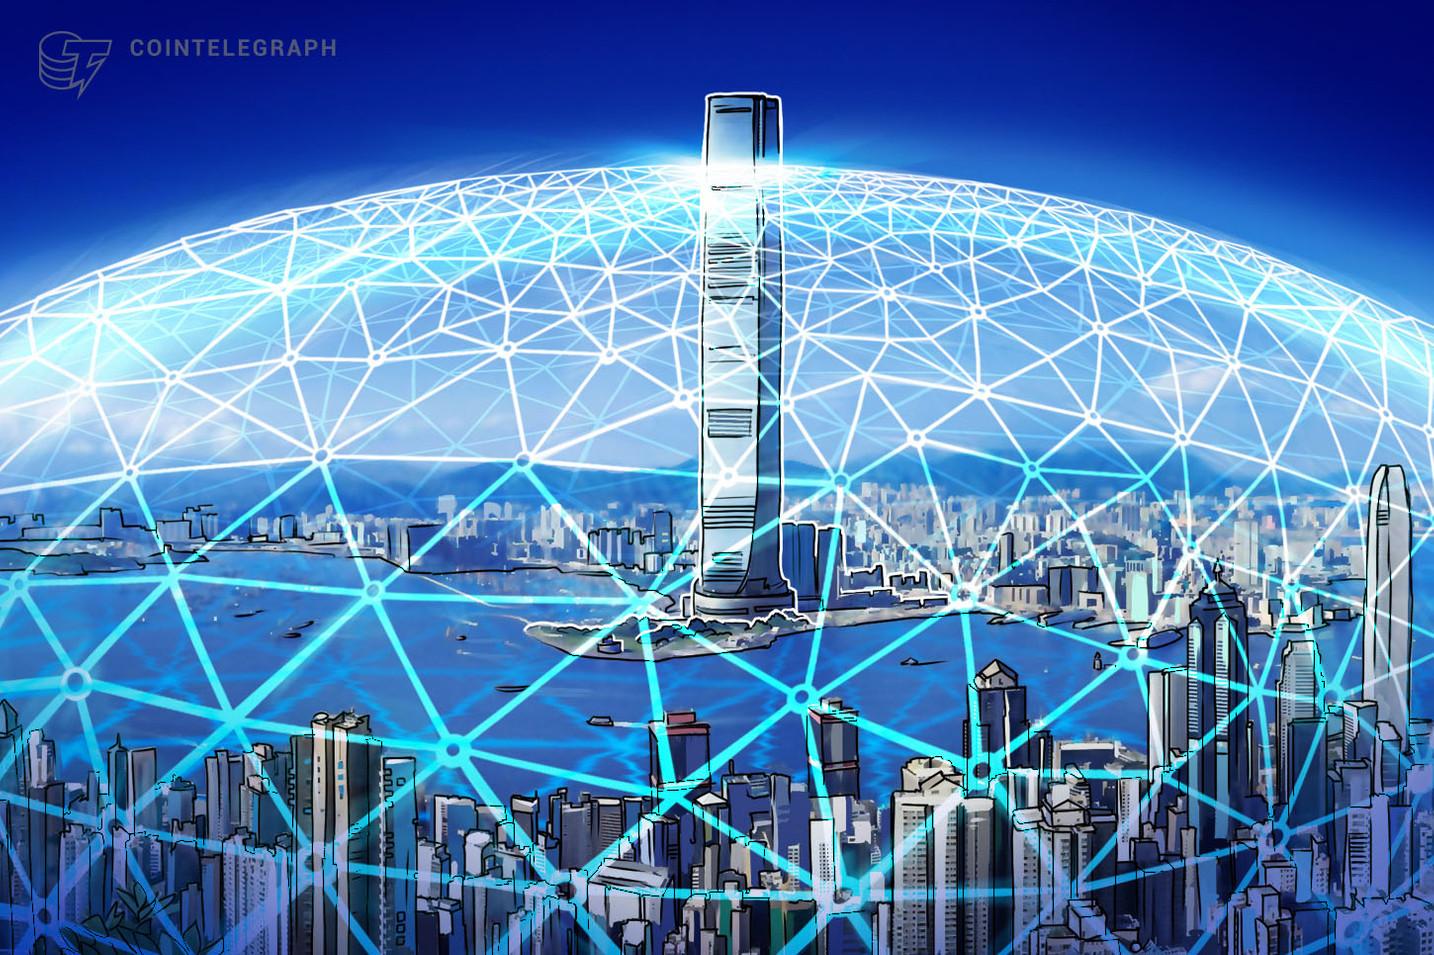 Hongkongs regulatorische Maßnahmen auf dem Weg zum Status als Internationaler Blockchain-Hub